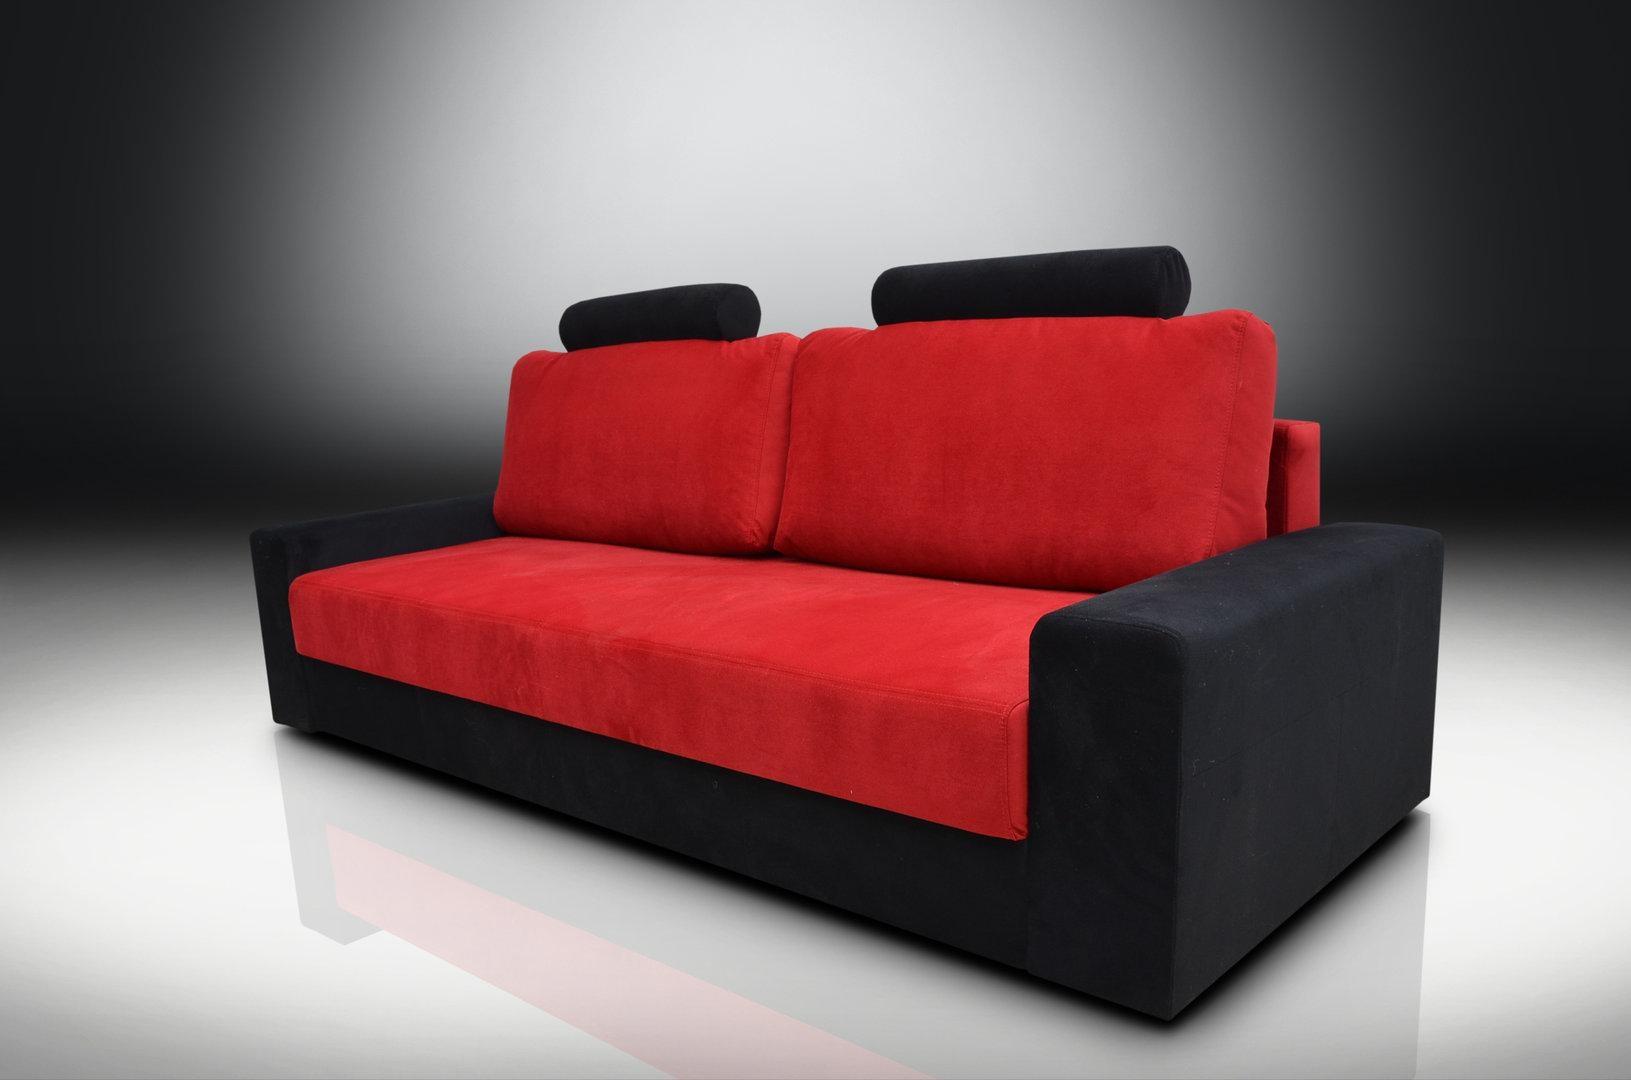 Bed Chicago Velvet Fabric Red / Black inside Sofa Red and Black